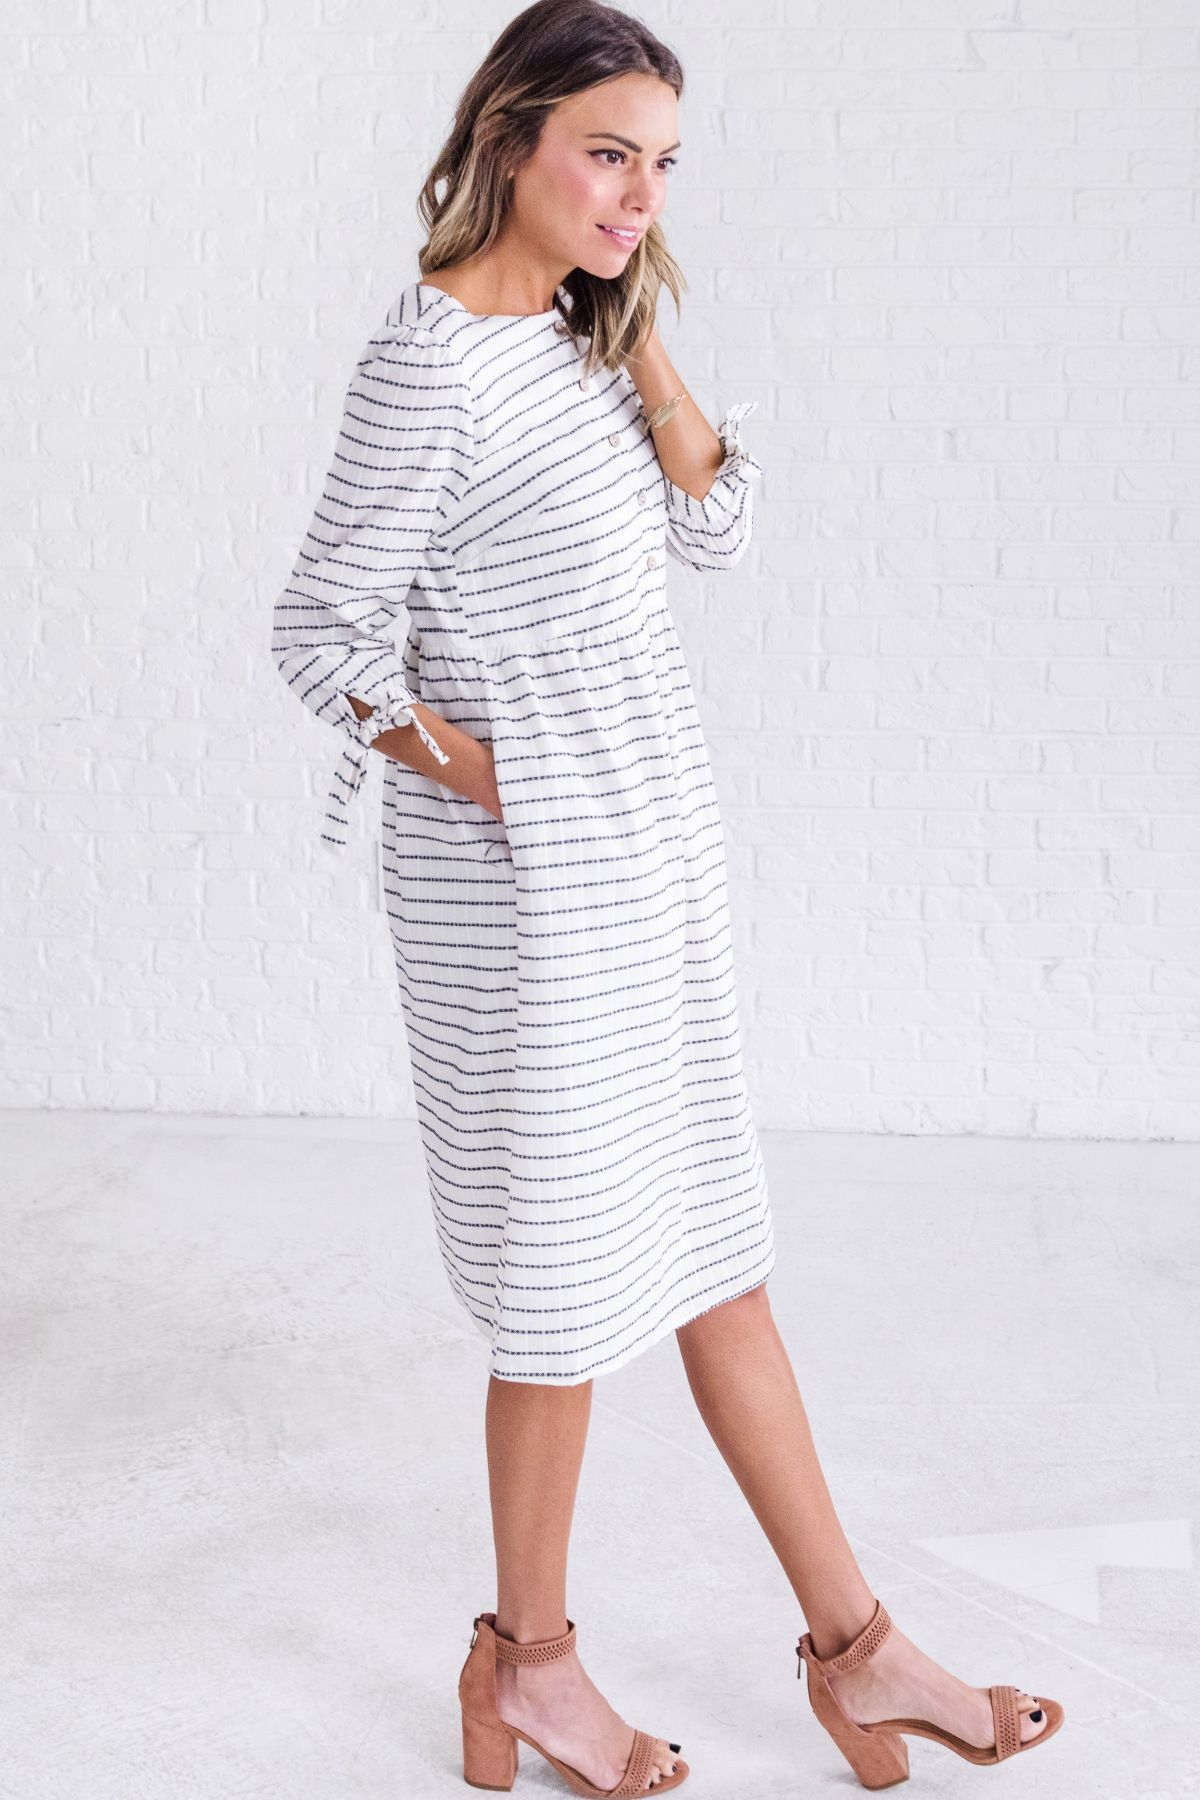 white striped dress, cute church outfits for women, cute spring